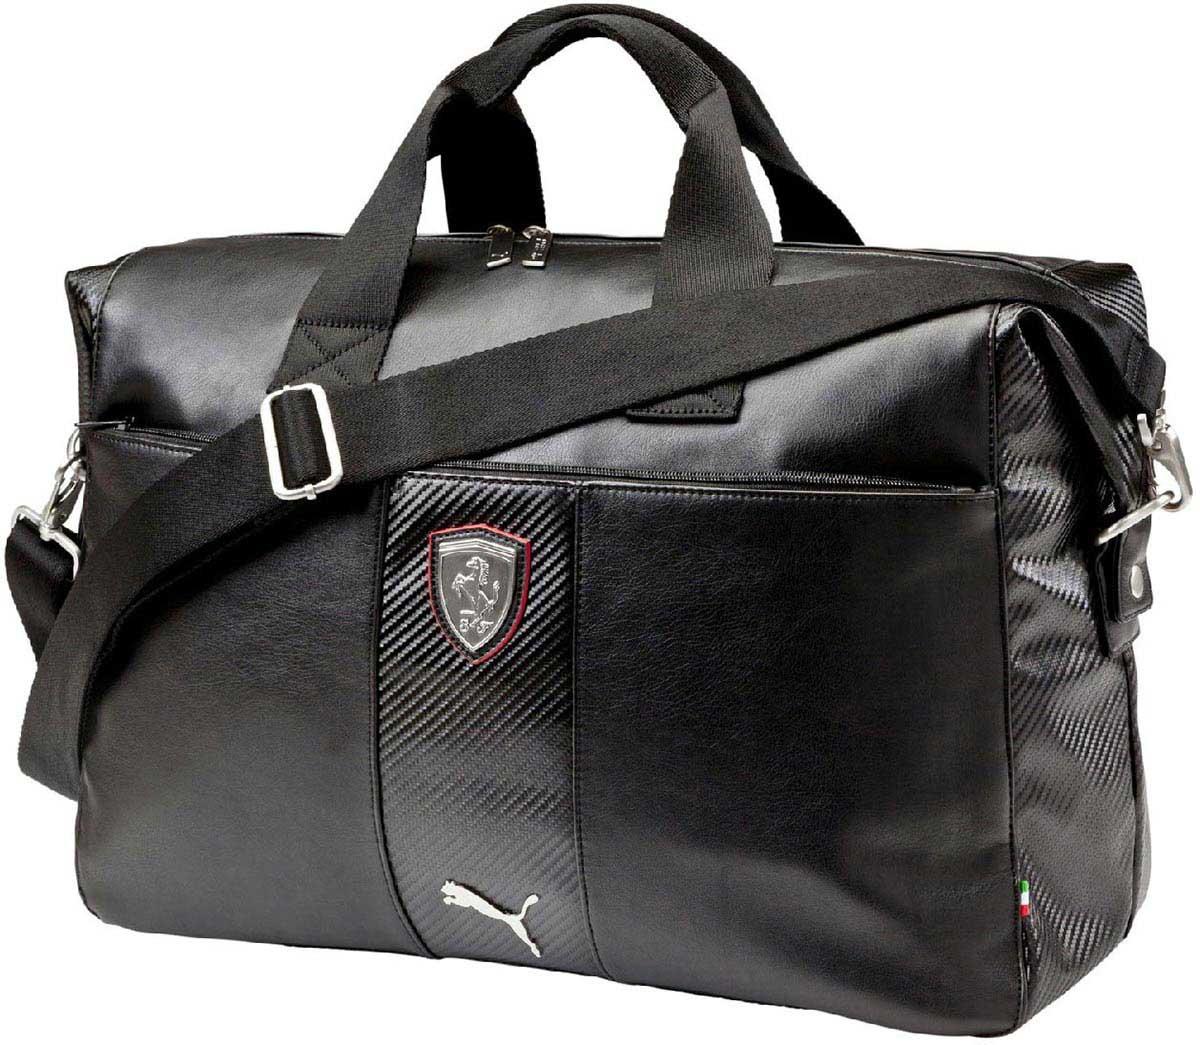 32052eb306e4 FERRARI LS WEEKENDER - Elegant bag